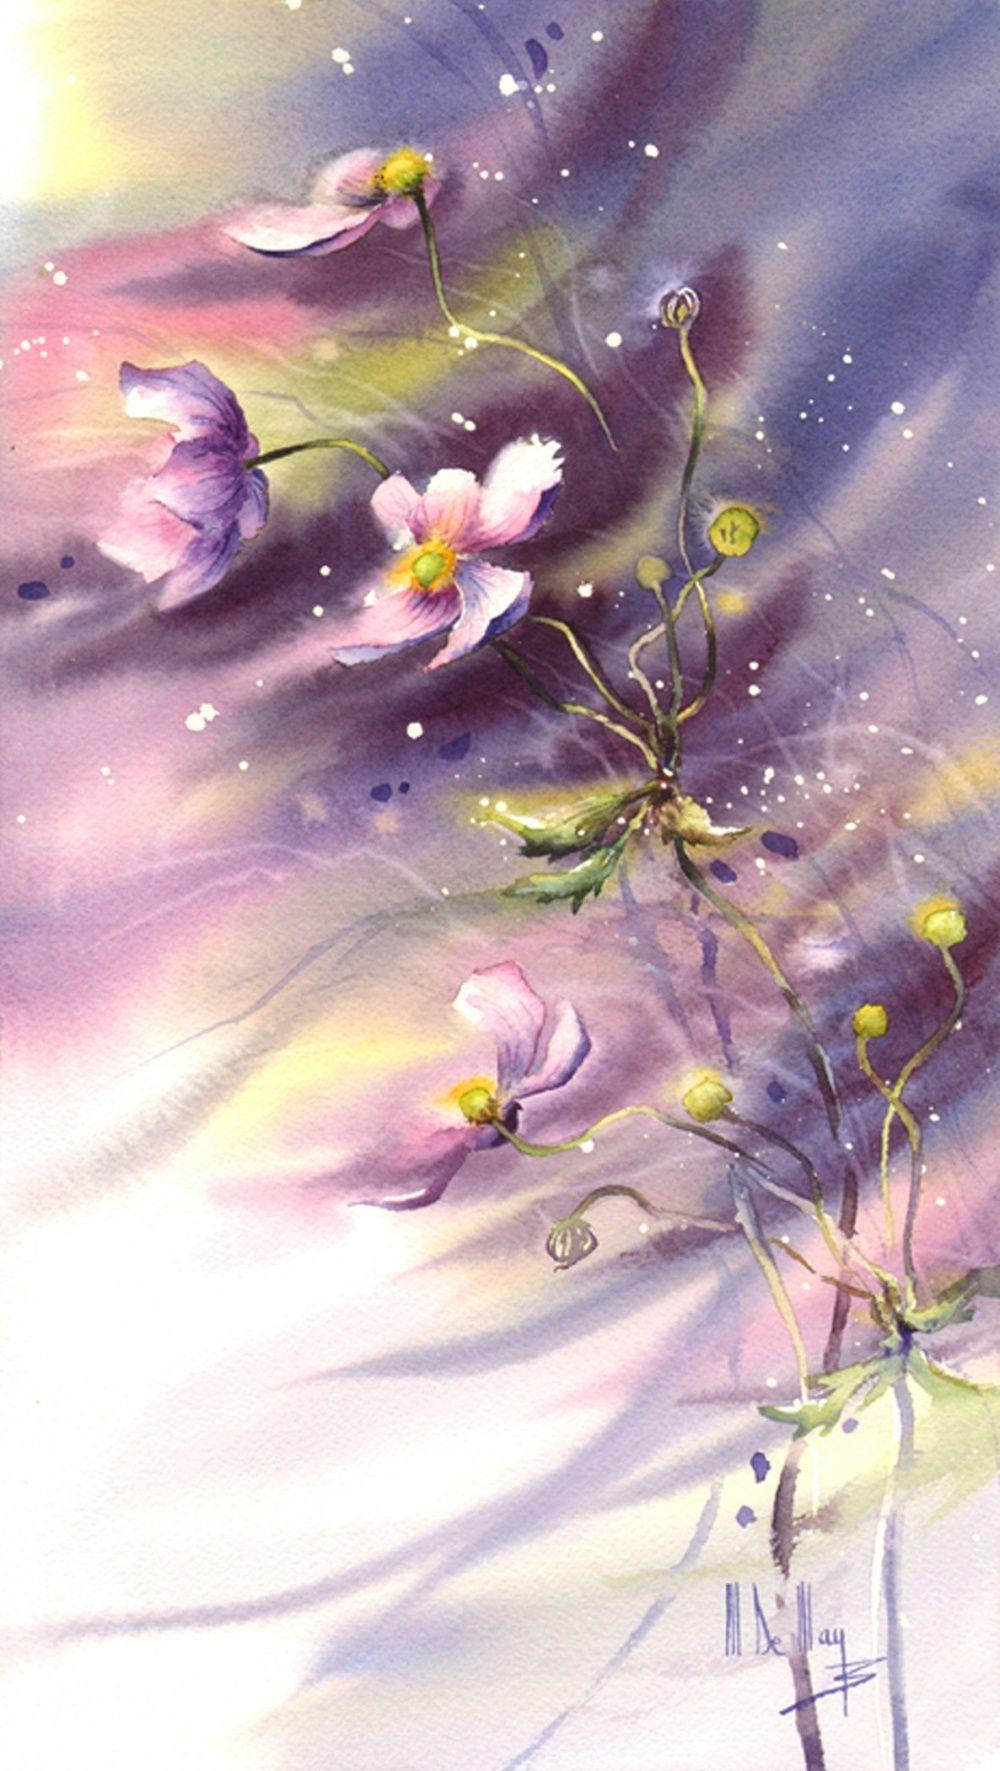 Galerie D Aquarelles Maryse De May En 2020 Peinture Fleurs